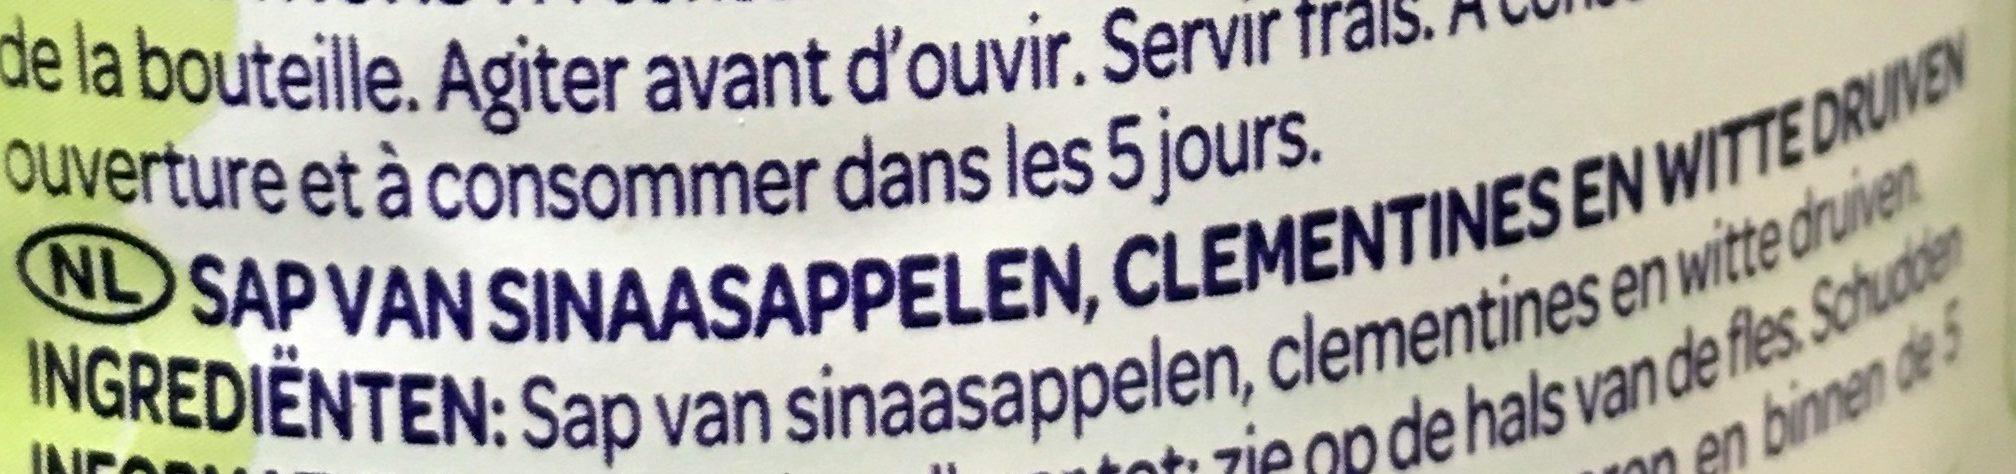 100% Pur jus Douceur du matin - Ingrediënten - nl